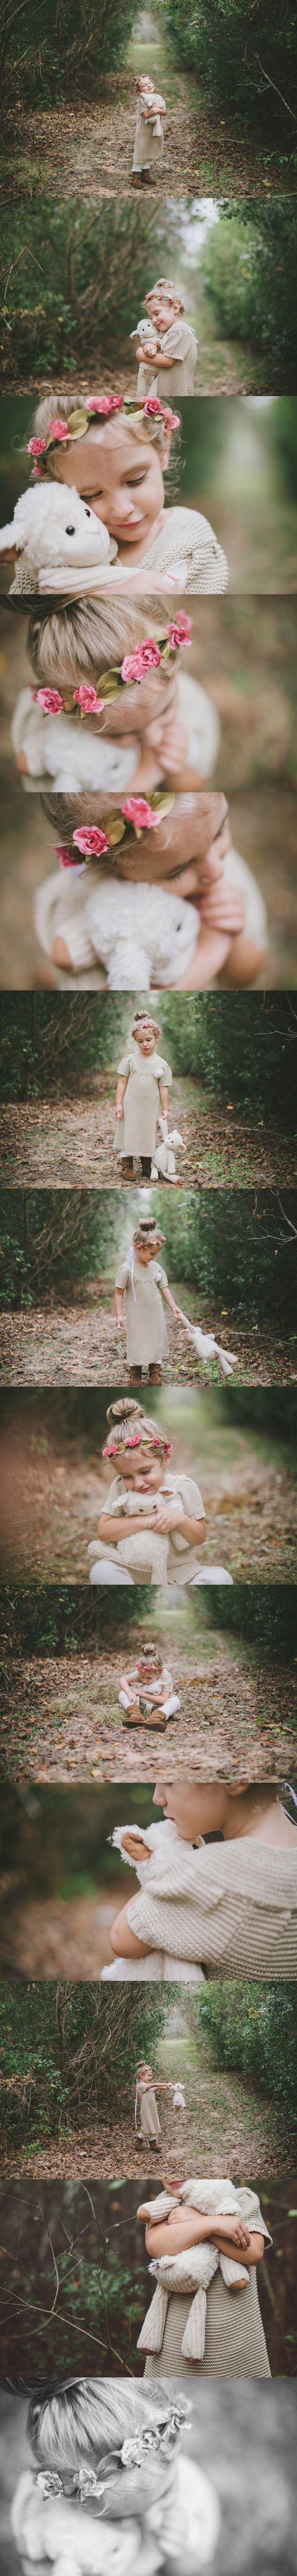 Jessi Field Photography | Children's Portraits Inspiration